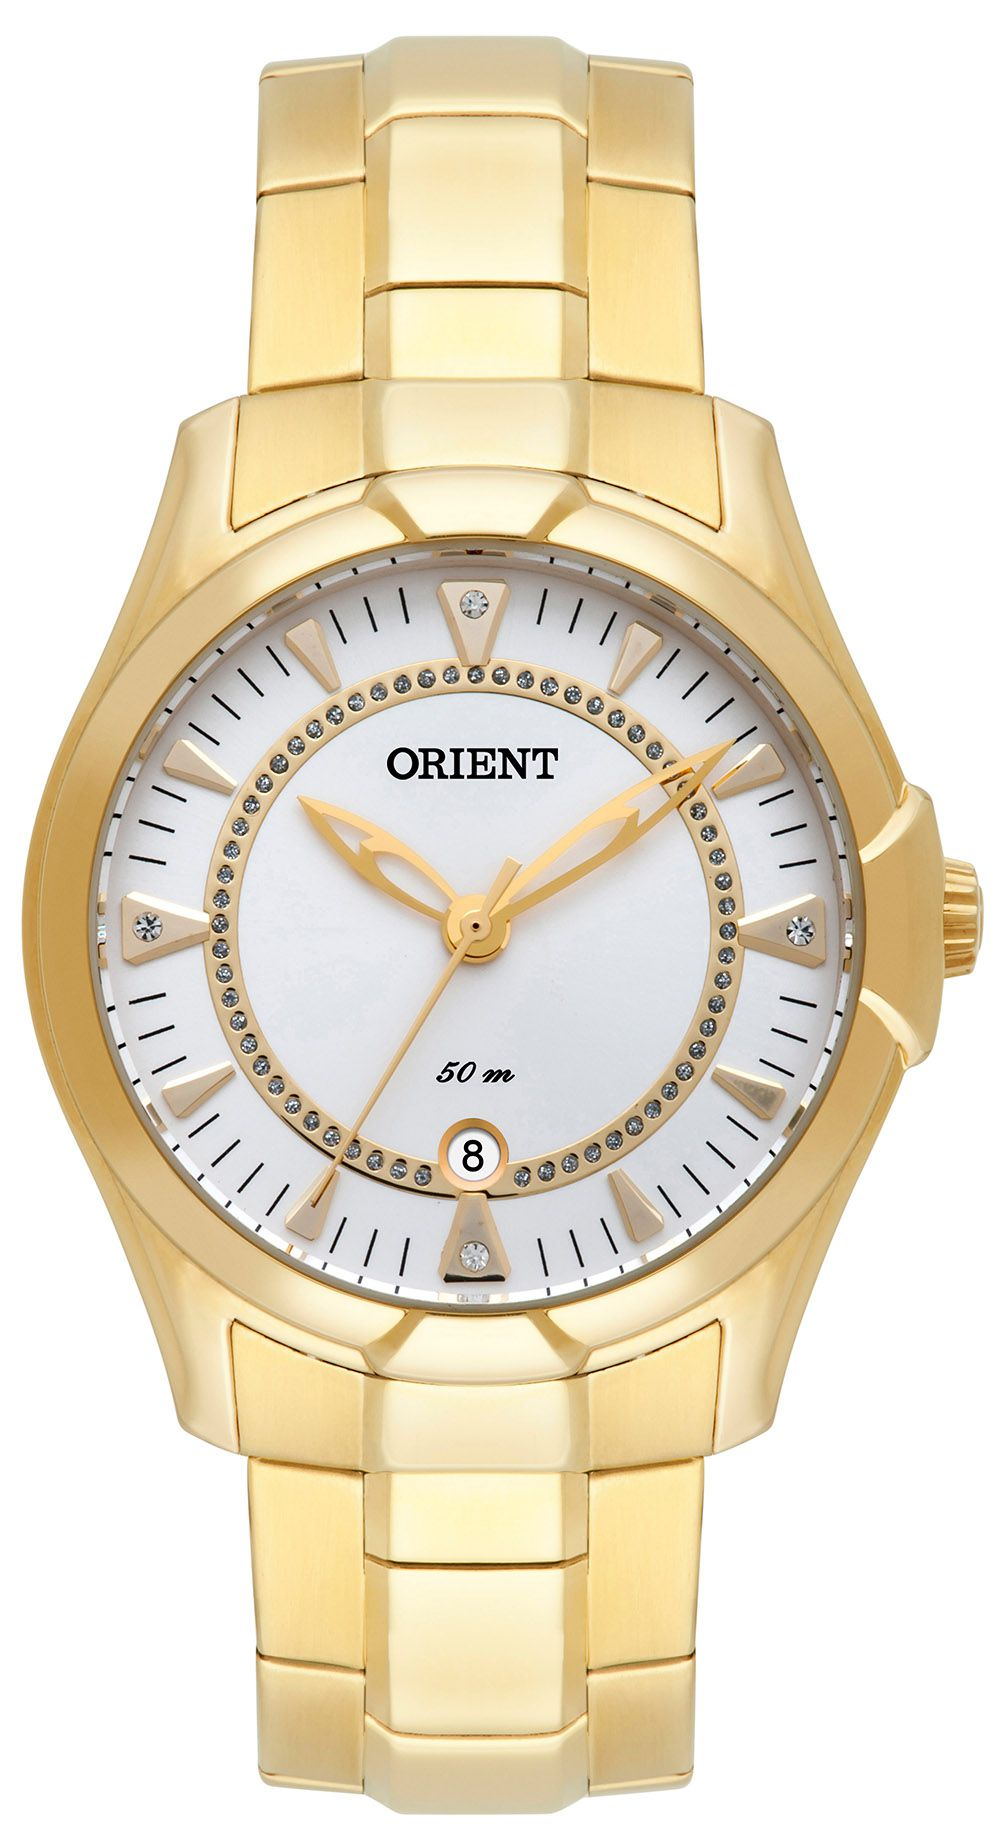 Relógio Orient Feminino FGSS1132-S1KX Dourado